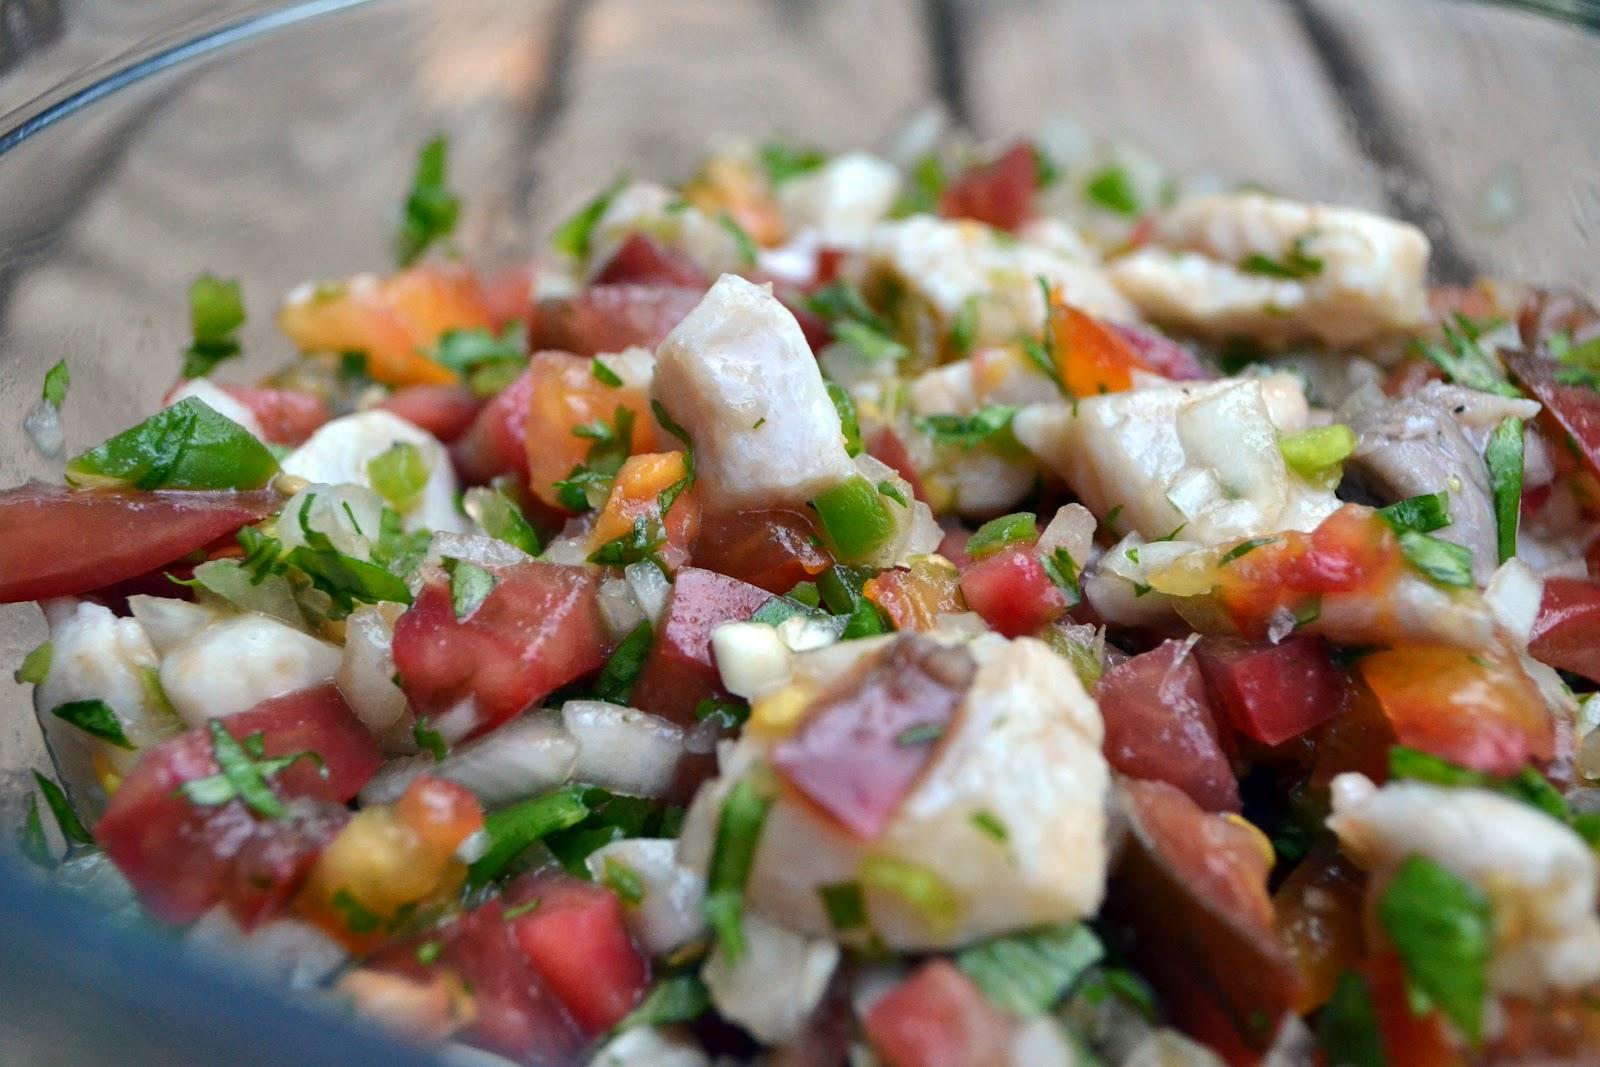 little c cooks: Mahi Mahi Ceviche with Heirloom Tomato Pico de Gallo